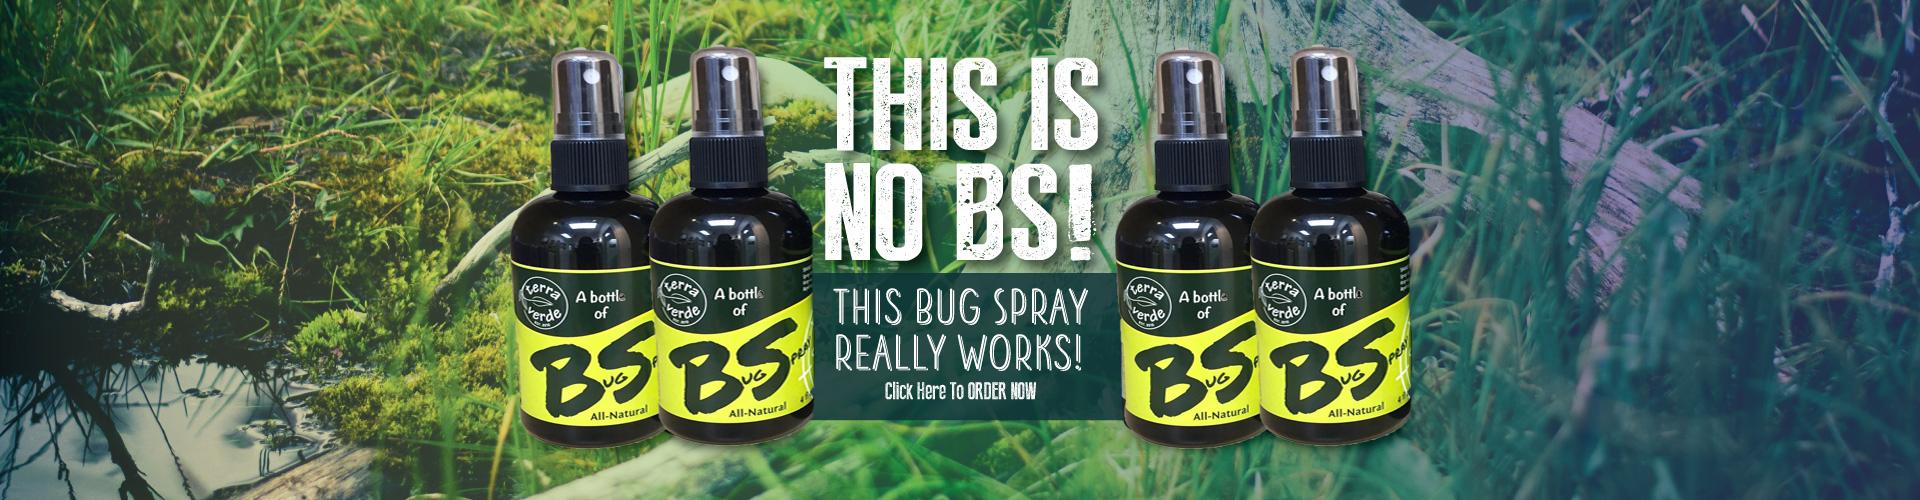 Terra Verde Bug Spray - Havre De Grace Maryland